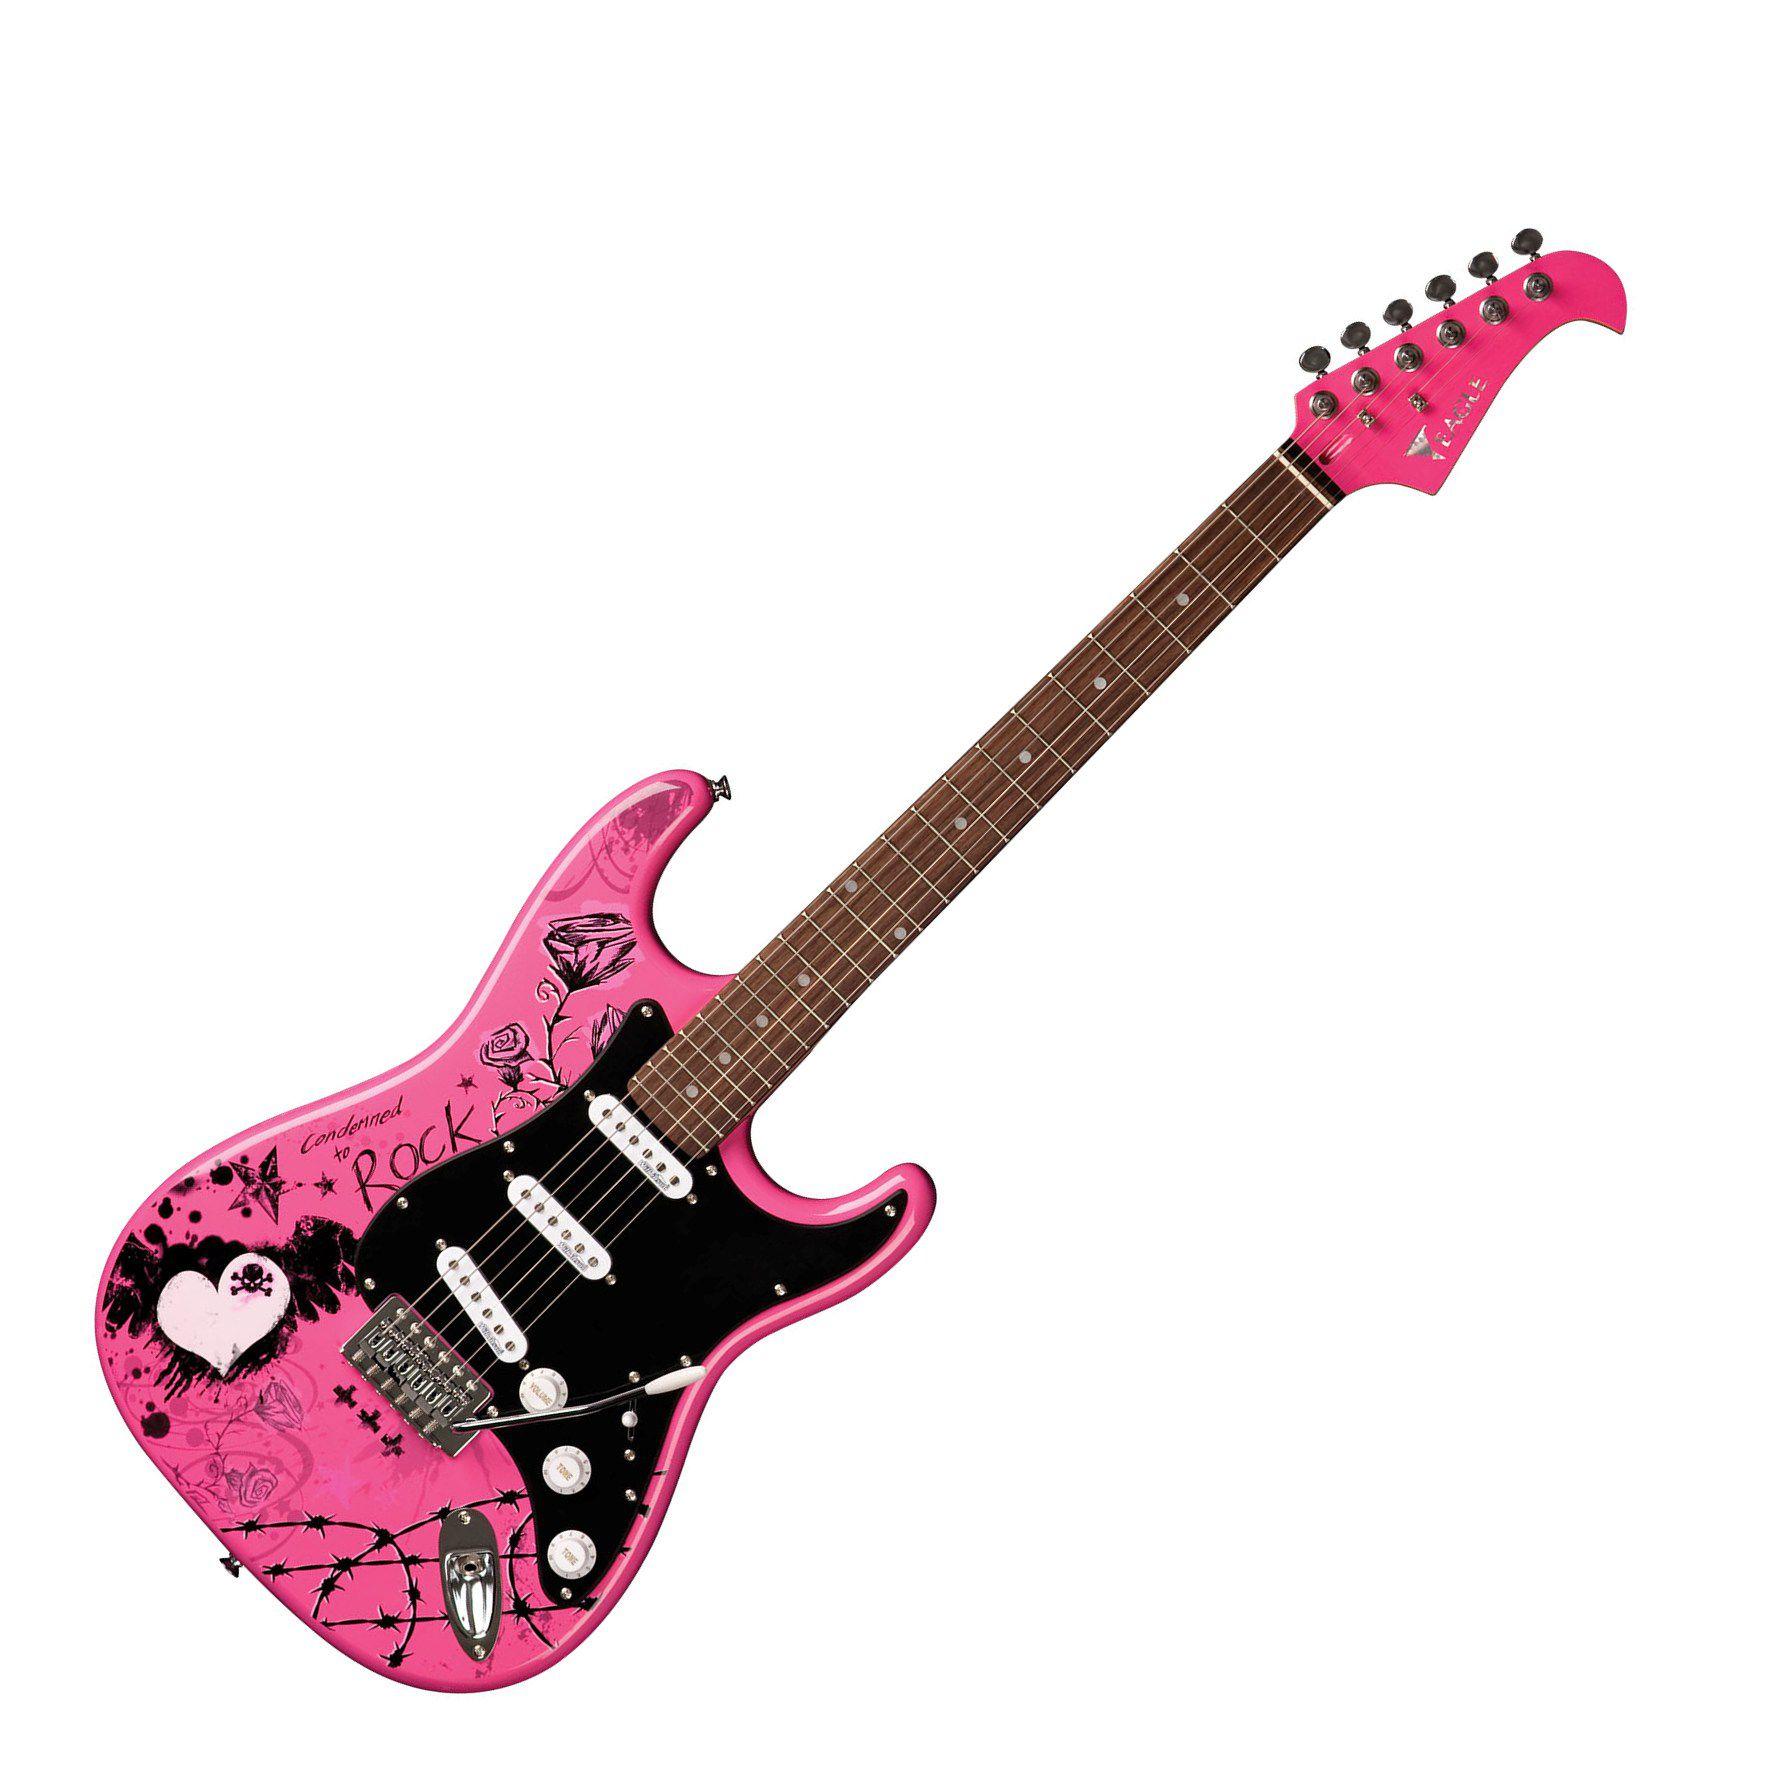 Guitarra Eagle Egp10 Crp Rock 3s Person.Strato Rosa